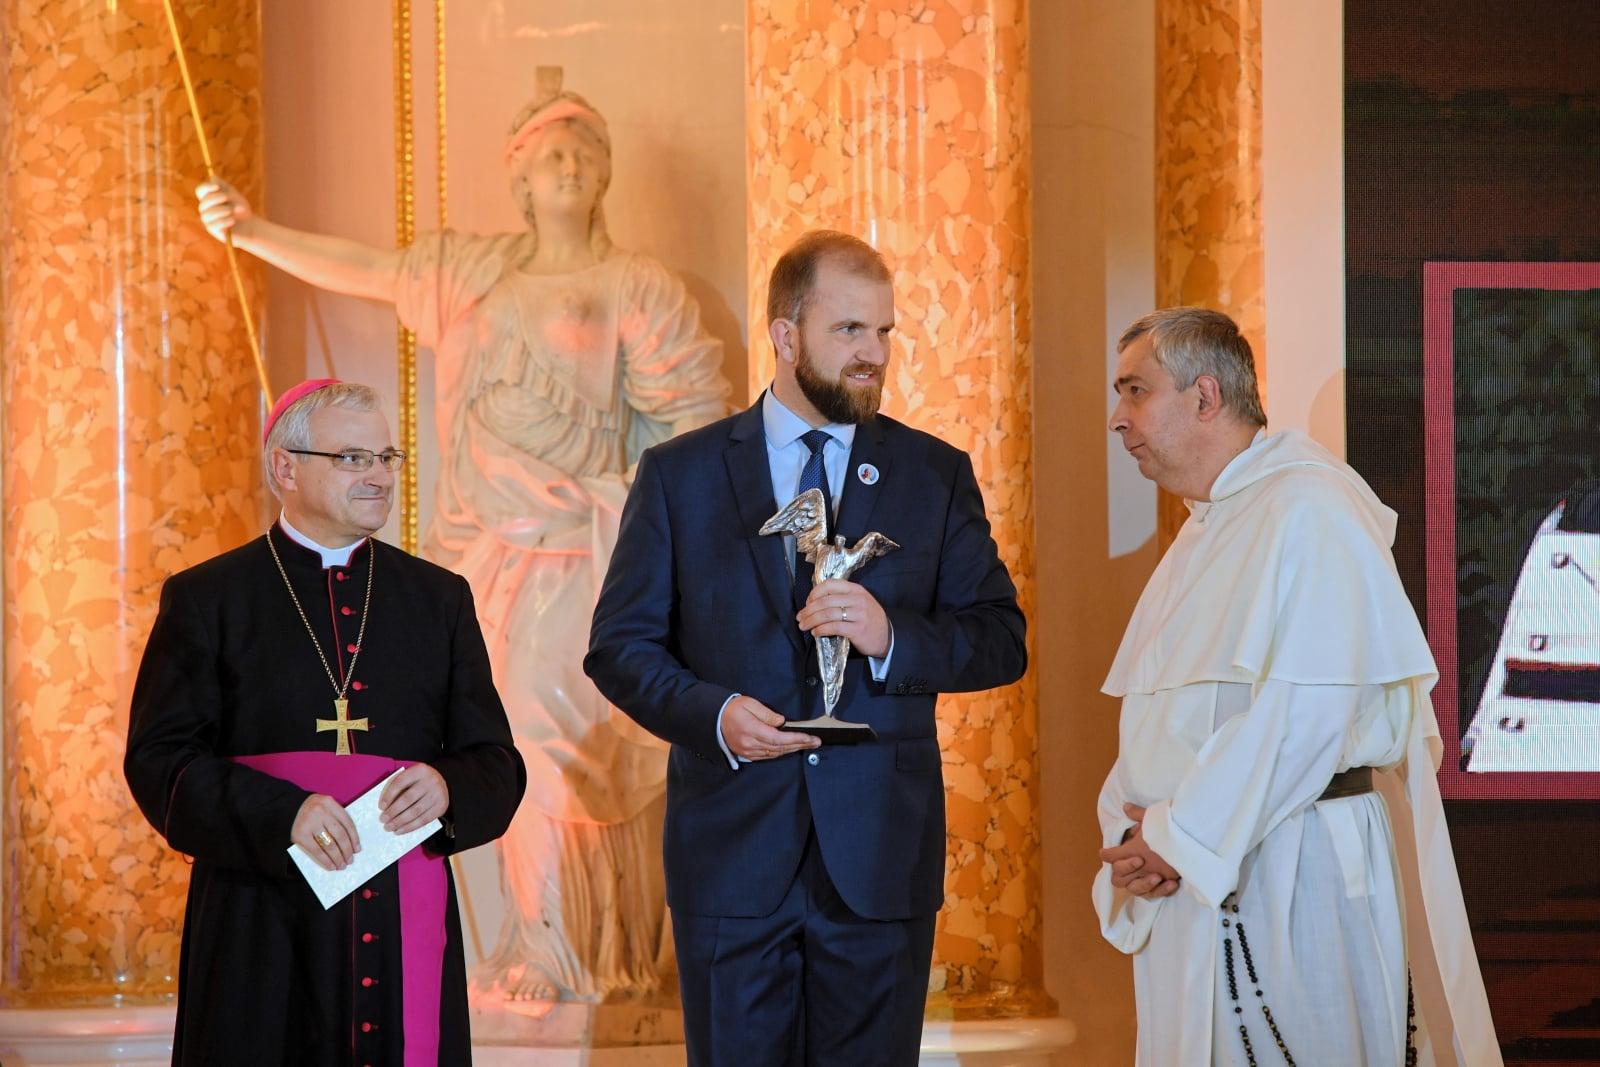 Gala nagrody Totus Tuus fot. PAP/Radek Pietruszka